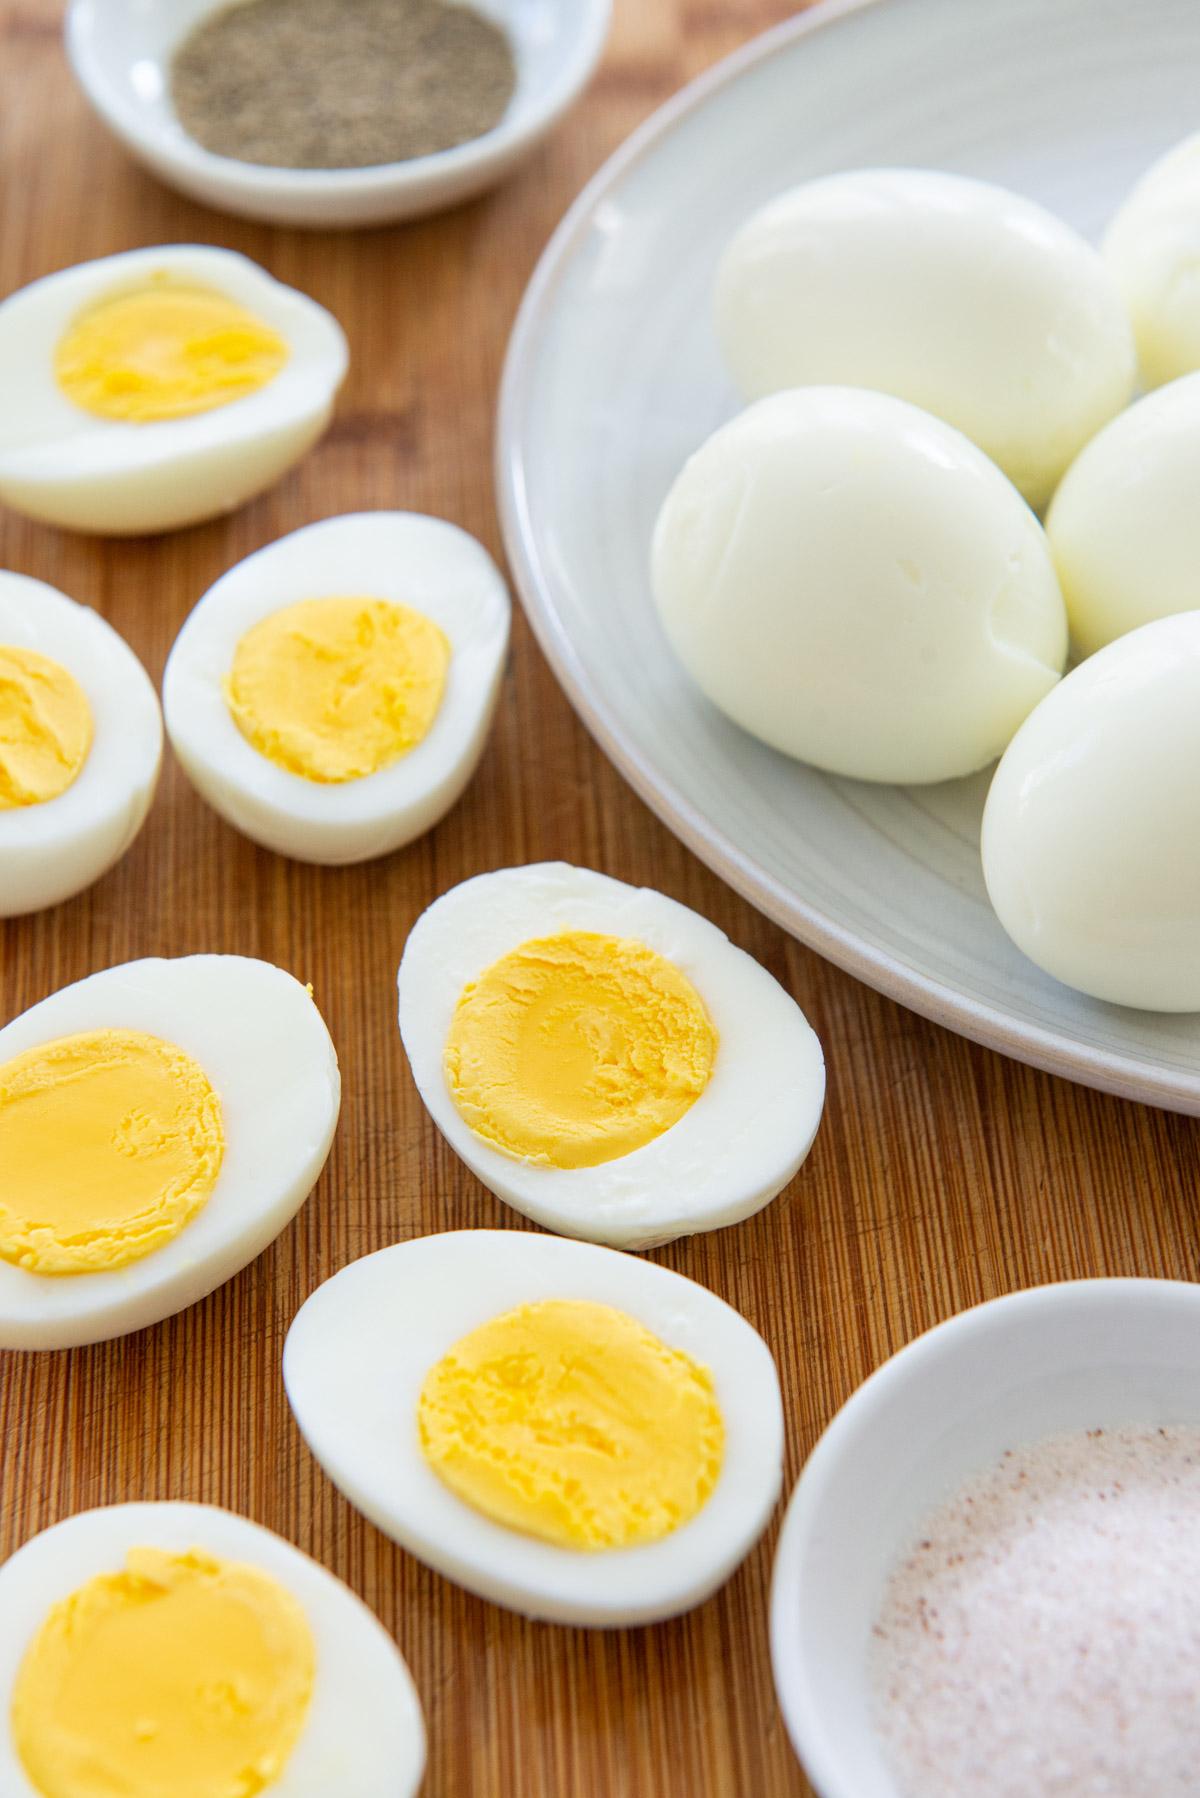 Hard Boiled Eggs Sliced in Half on Wooden Board